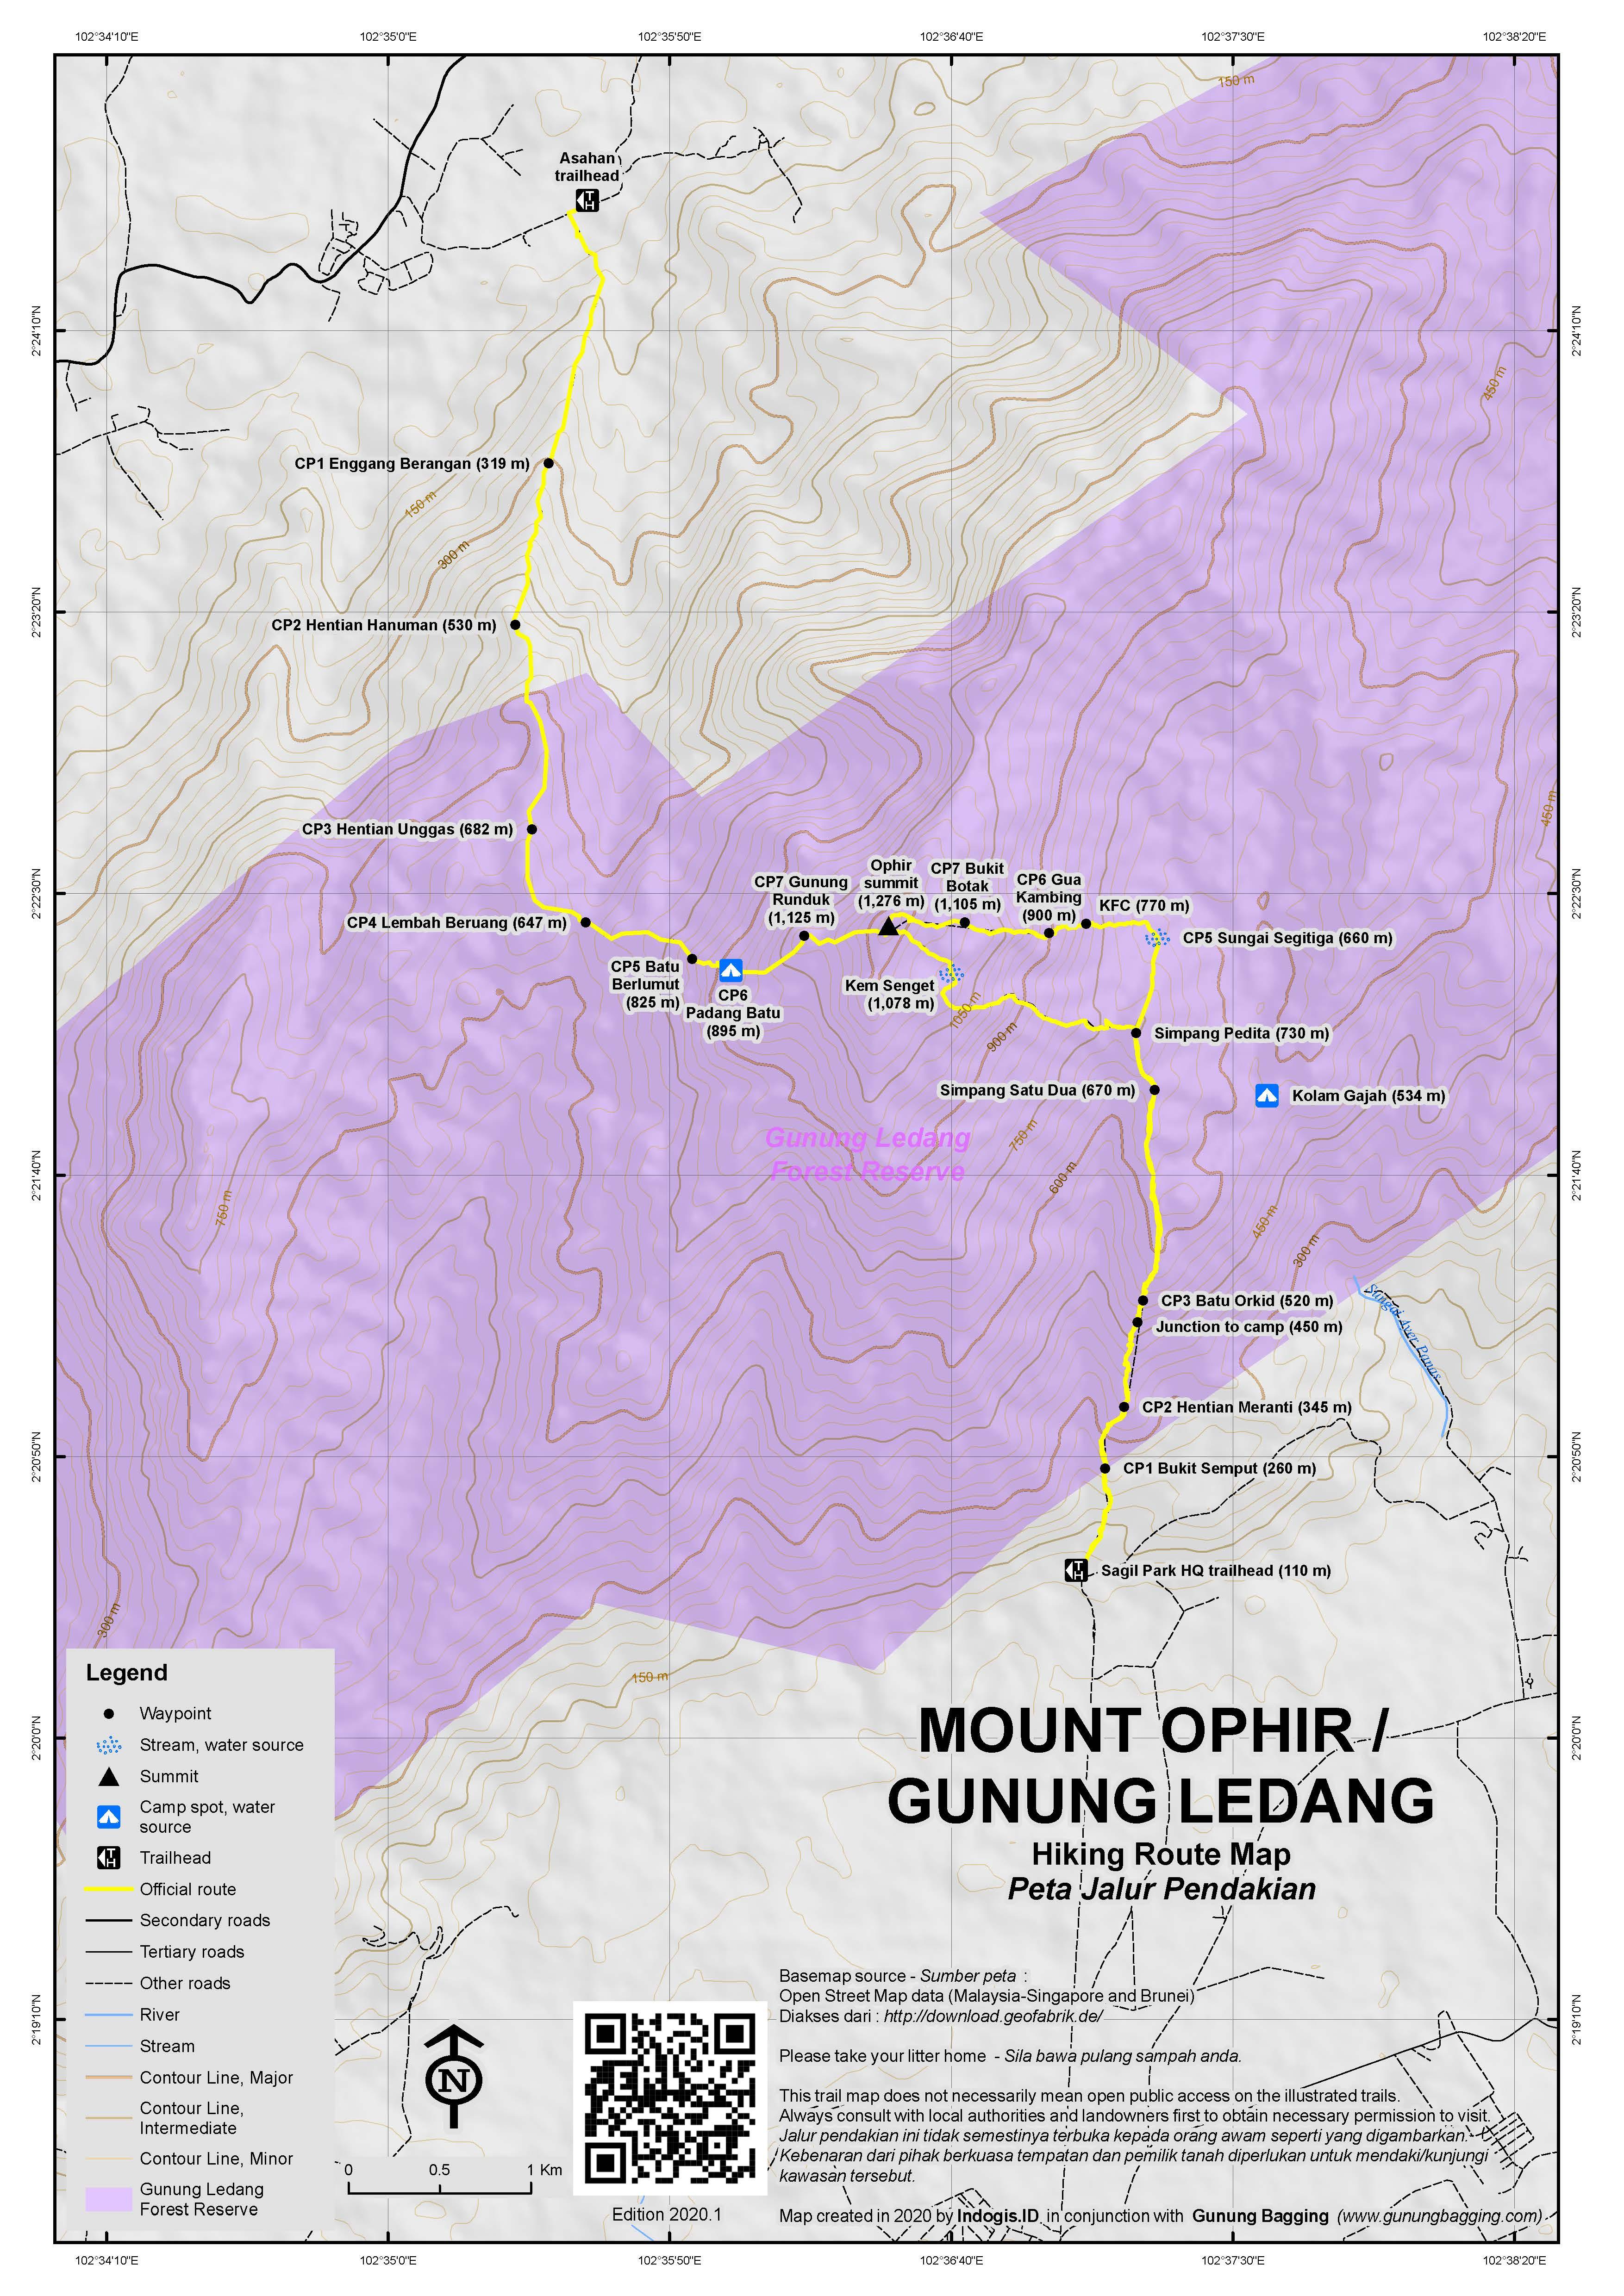 Peta Jalur Pendakian Gunung Ophir / Ledang